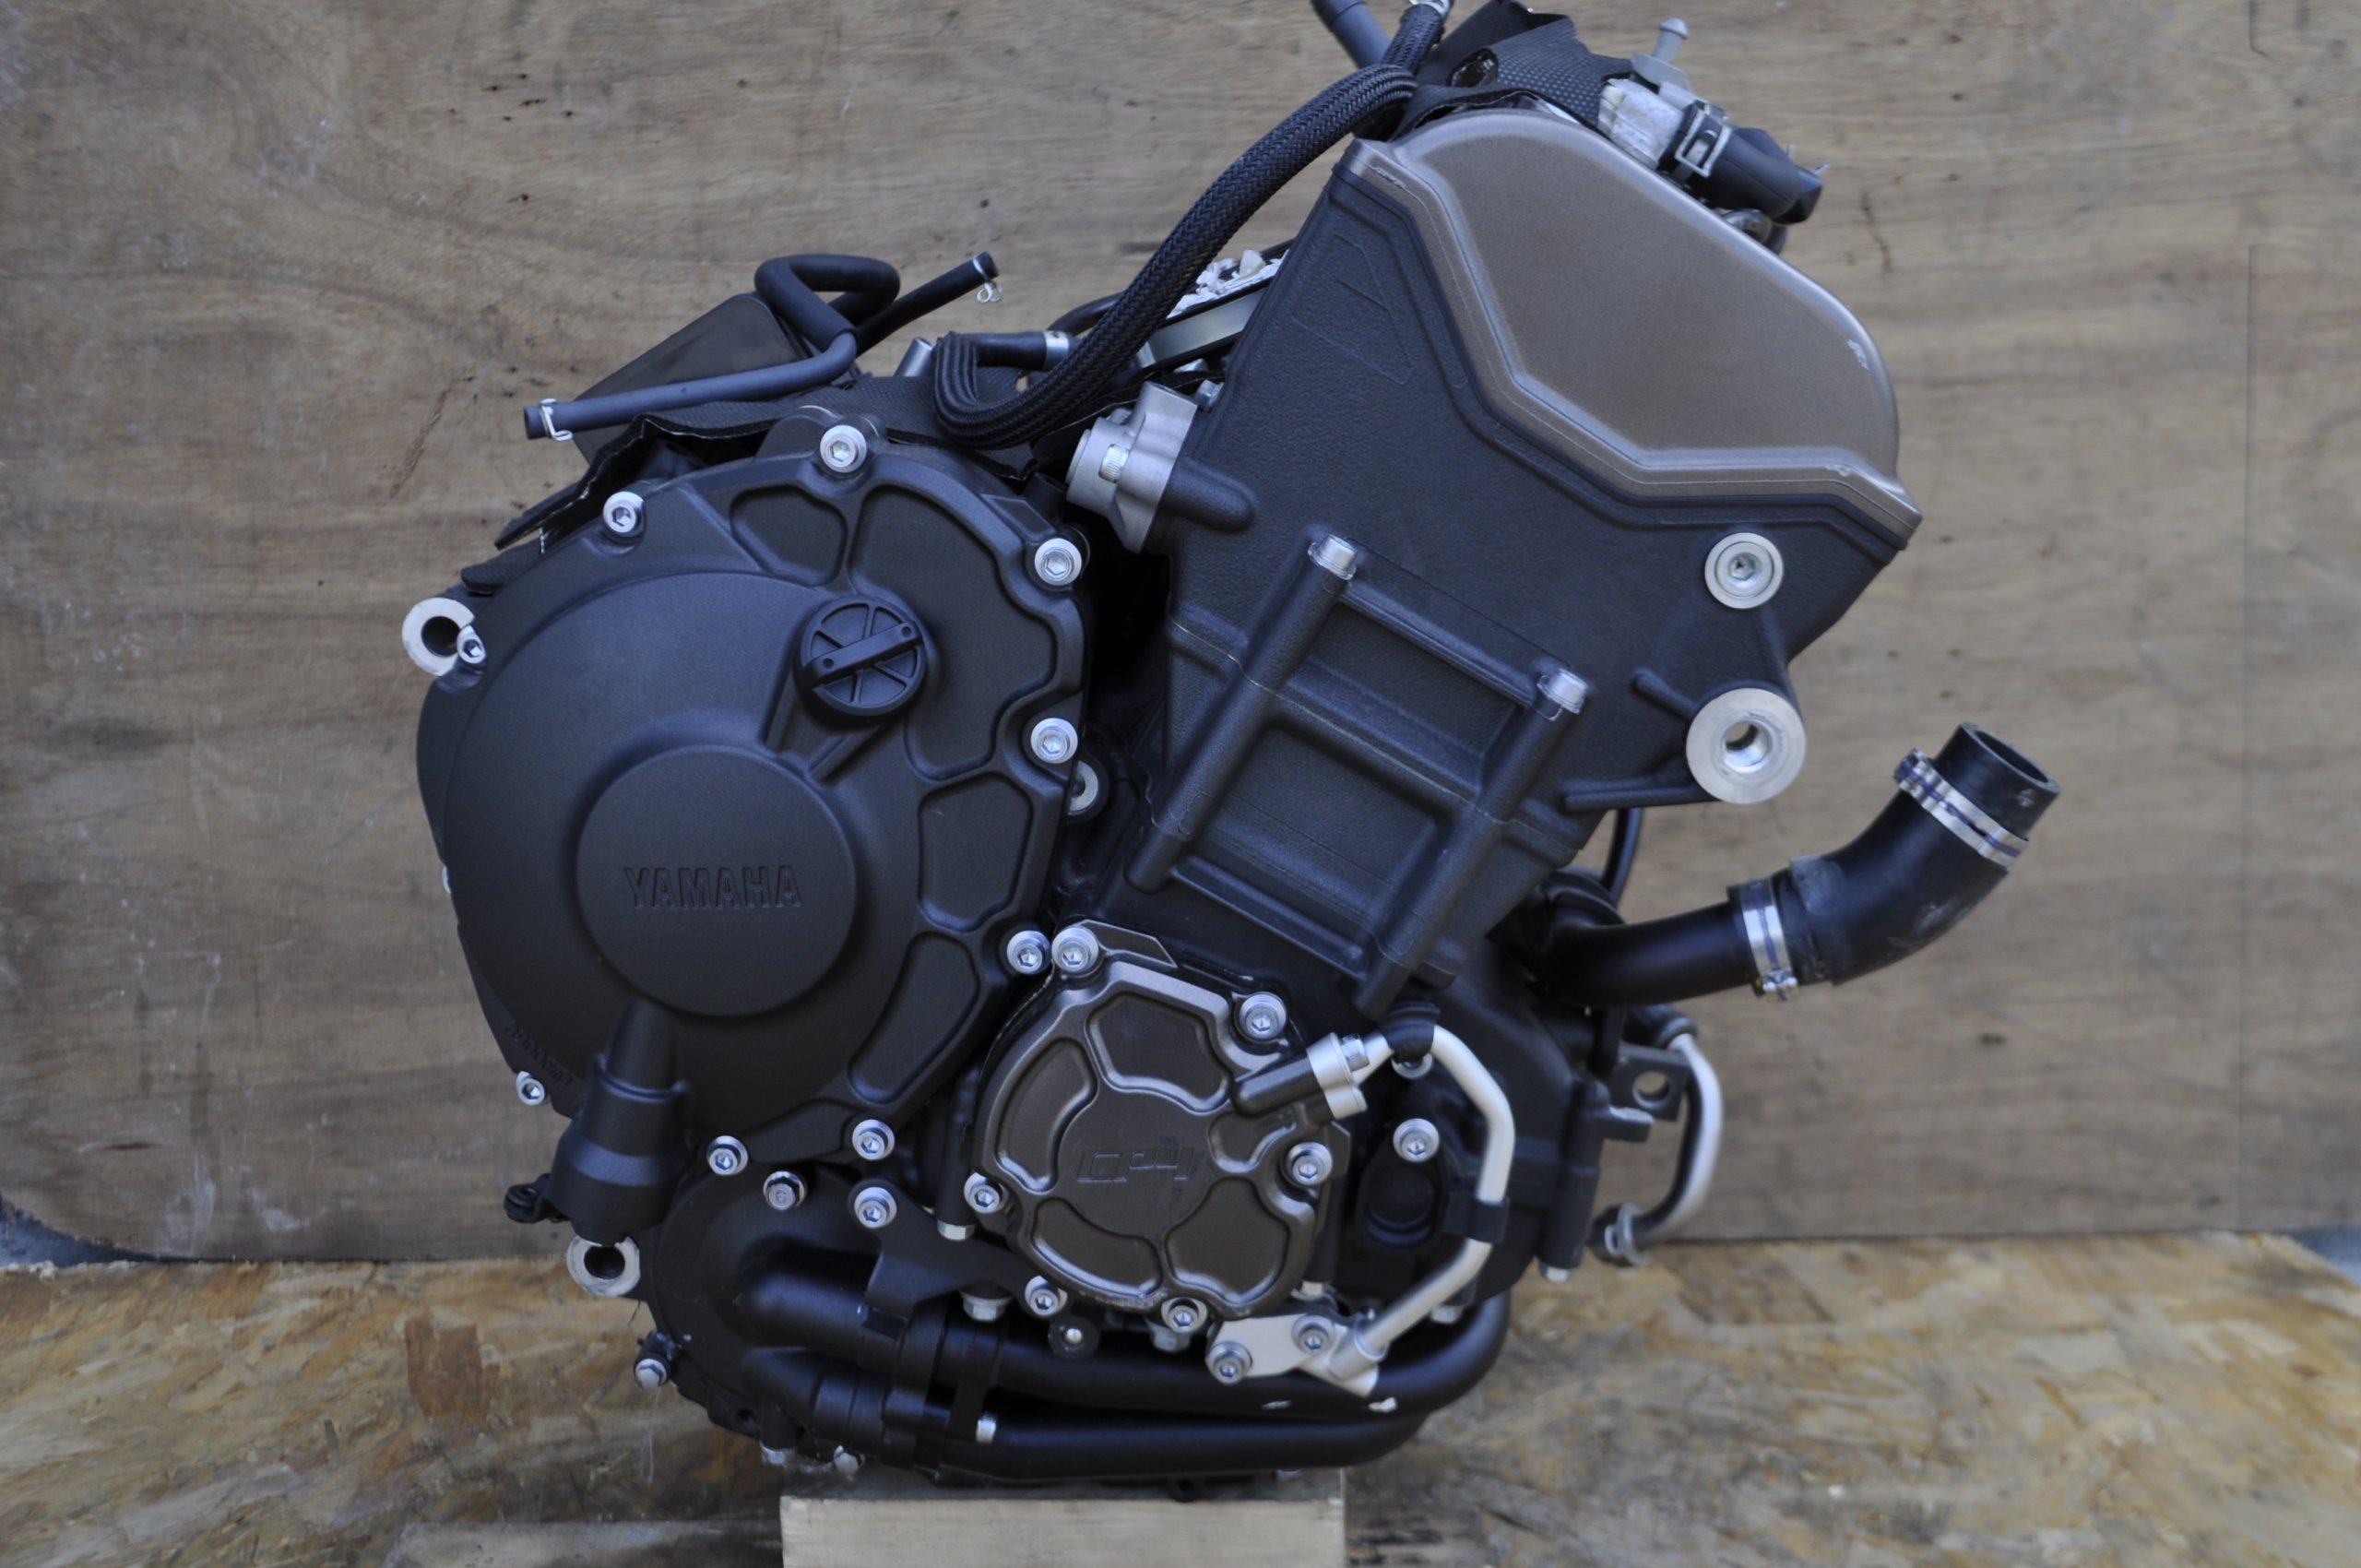 Silnik Yamaha Mt 10 Mt 10 Sp 2016 Rok Sokolniki Allegro Pl